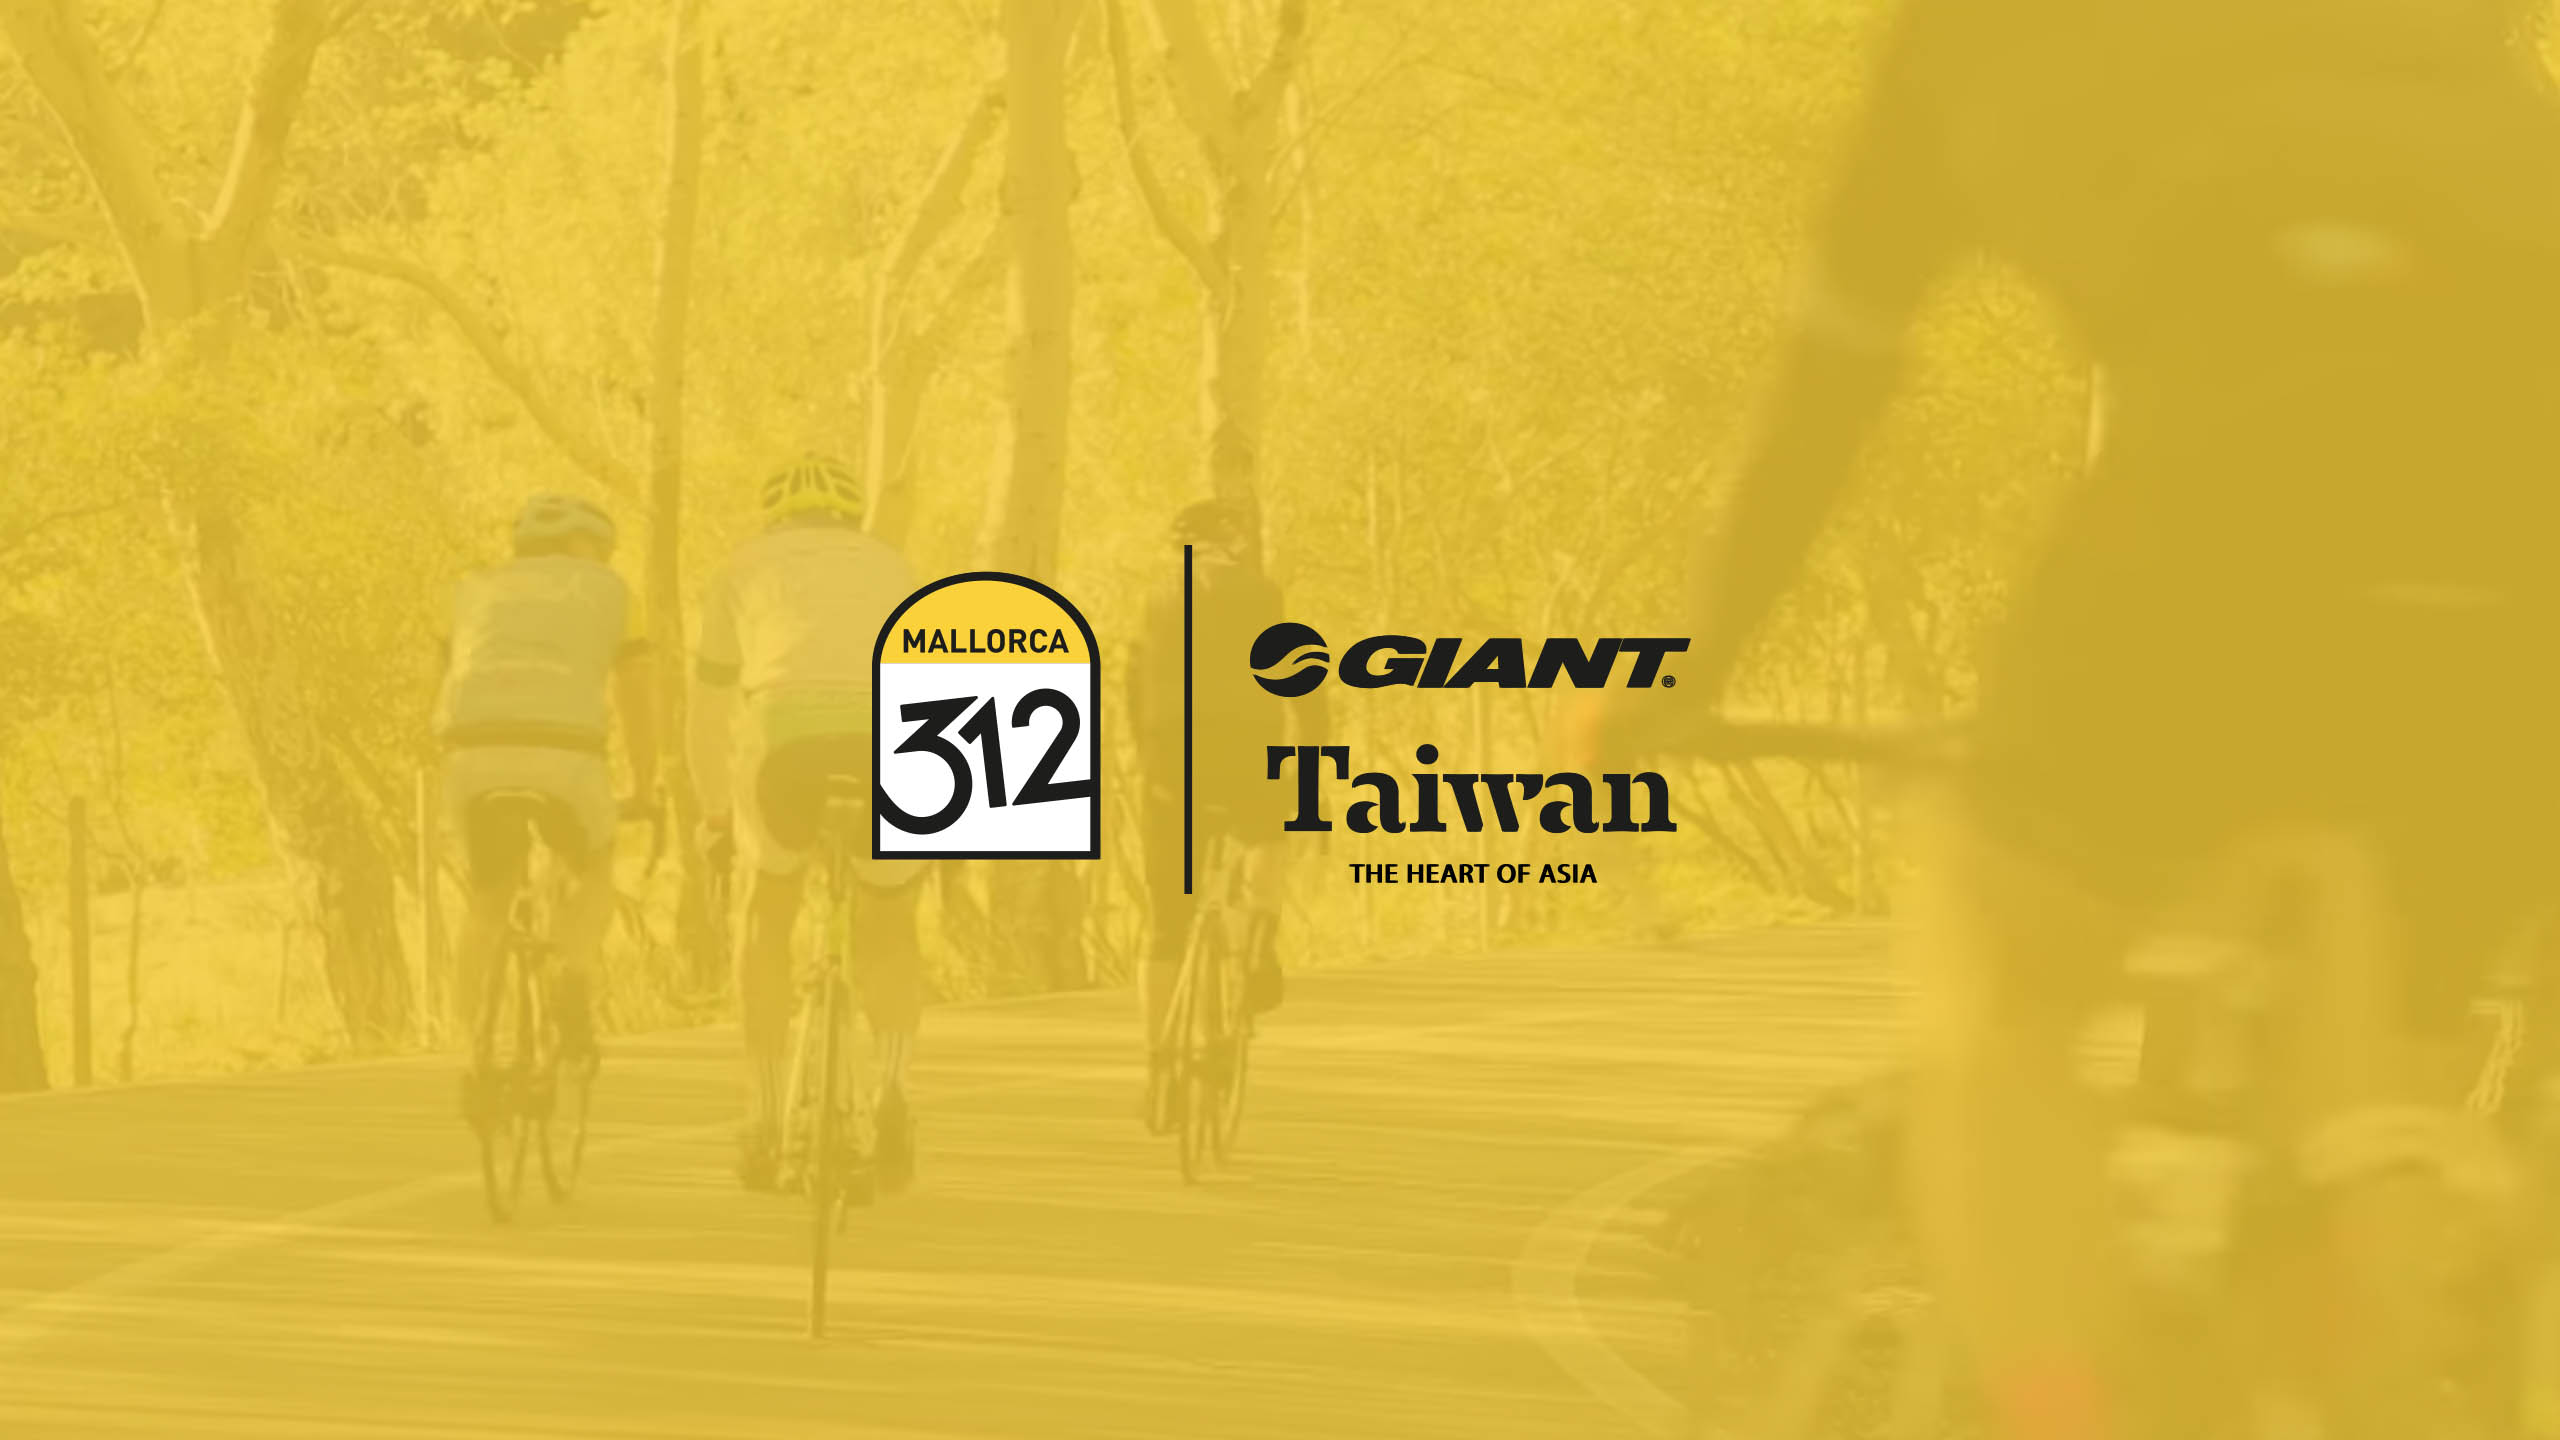 Mabull Events | Proyectos | Mallorca 312: Vuelta internacional cicloturista (5)